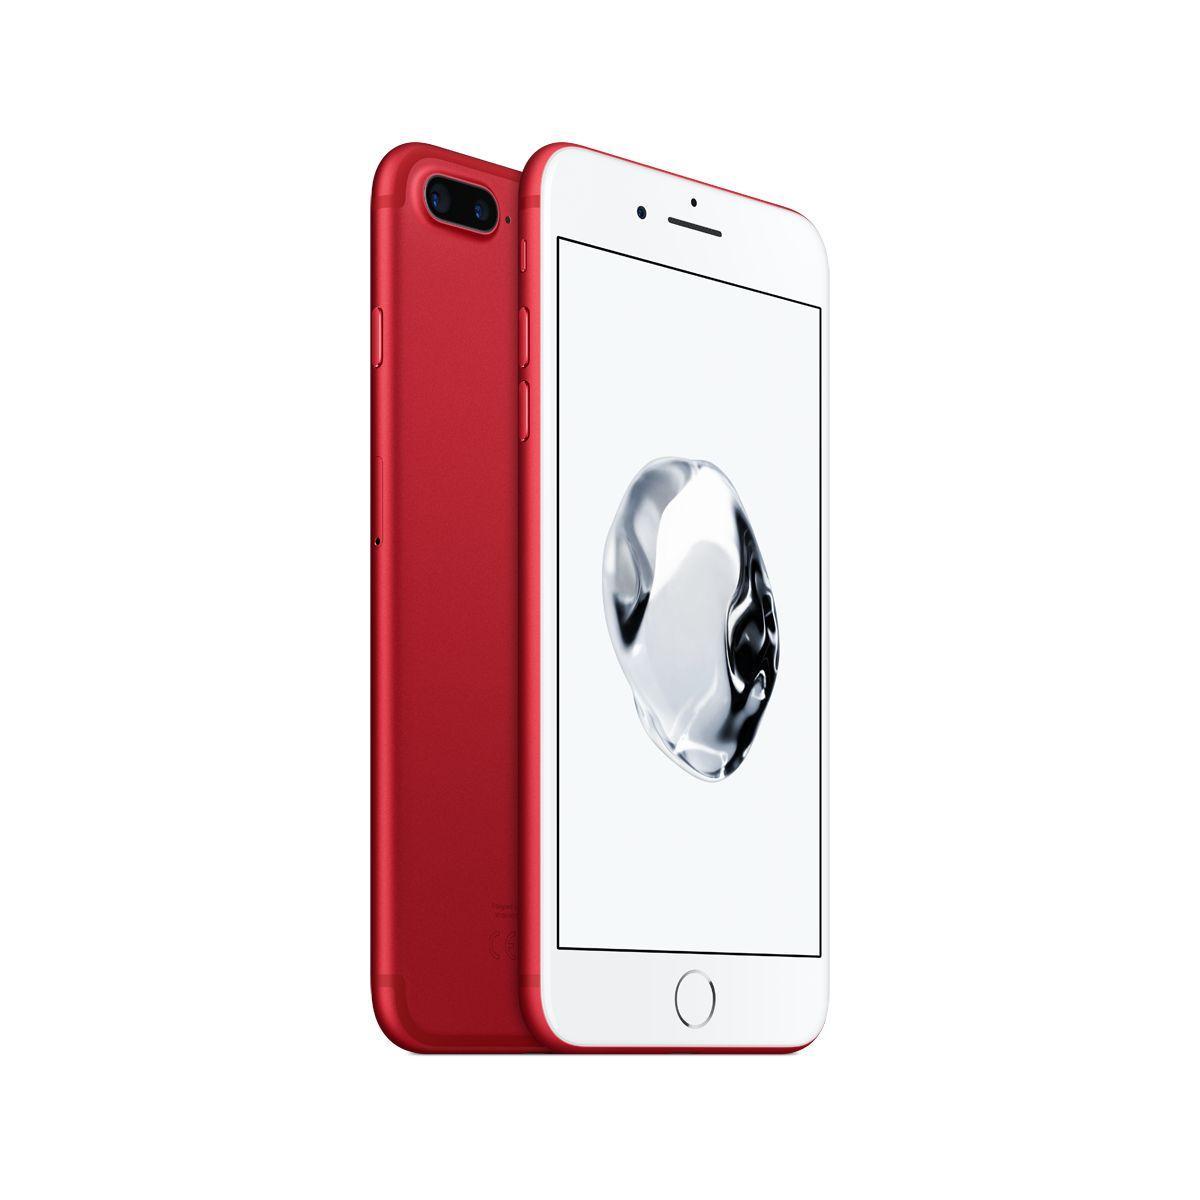 Apple iphone 7 256go rouge - livraison offerte : code chronoff (photo)